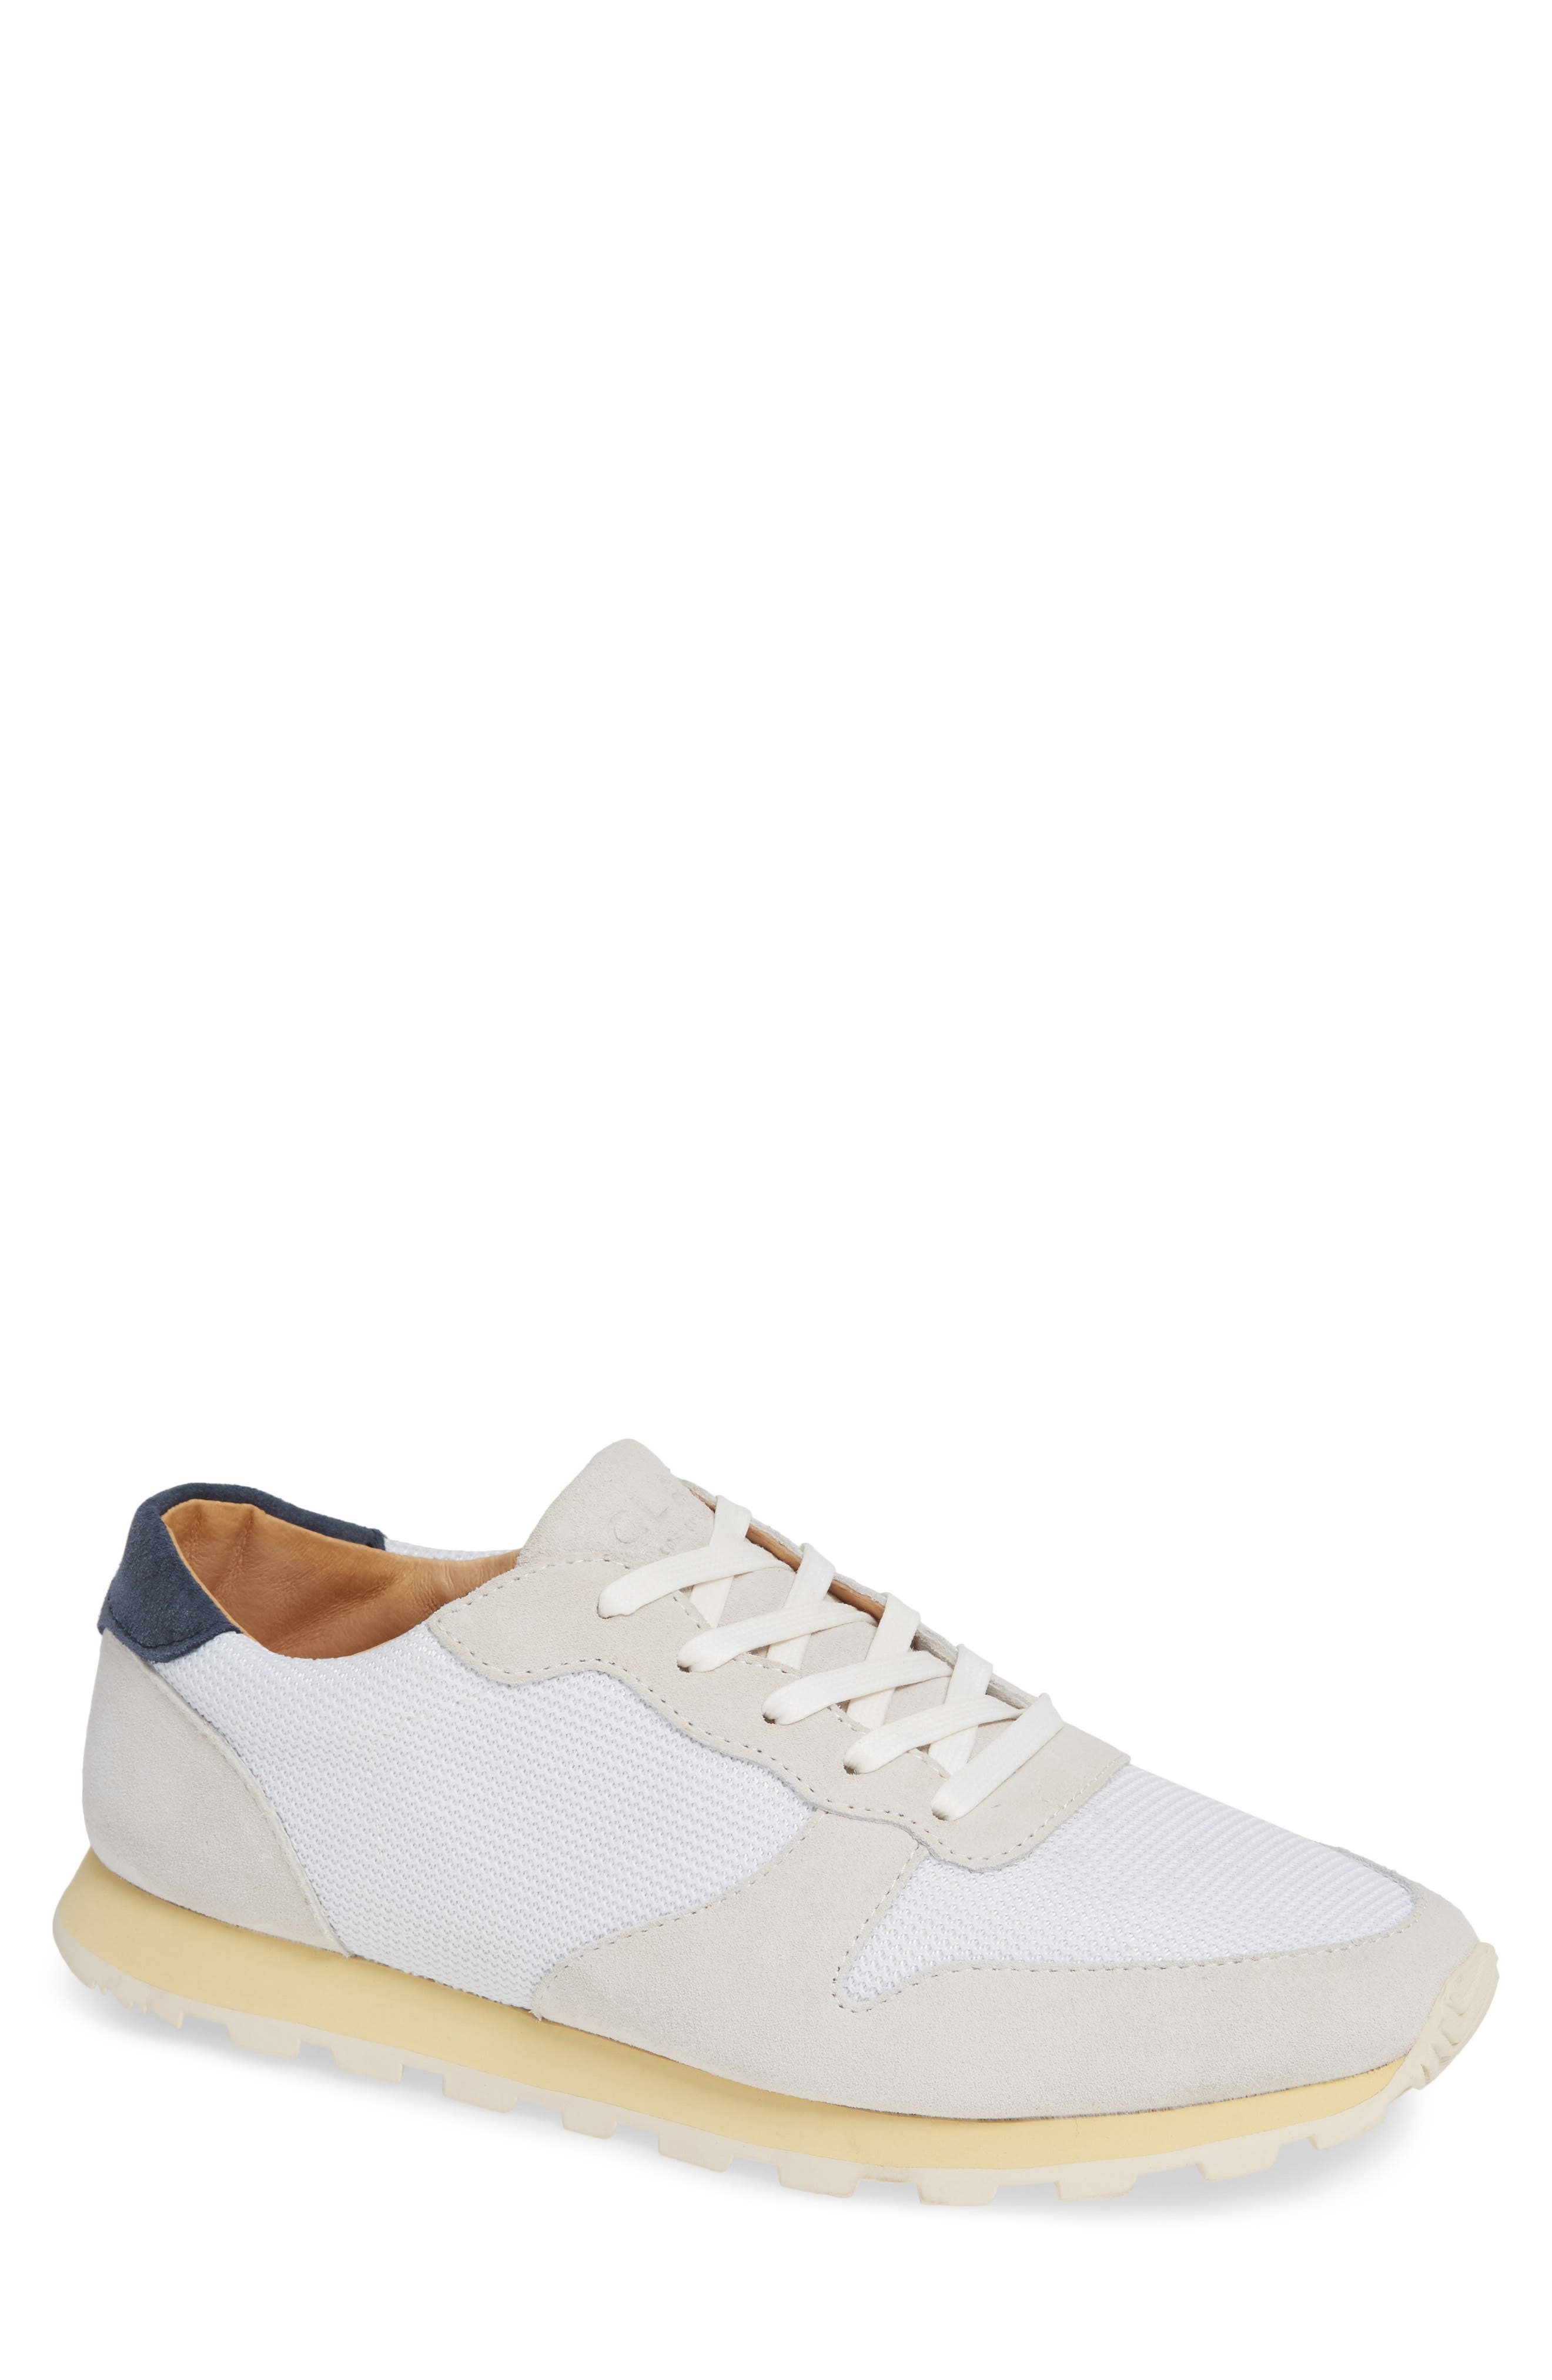 Hayward Sneaker,                         Main,                         color, WHITE SUEDE NAVY